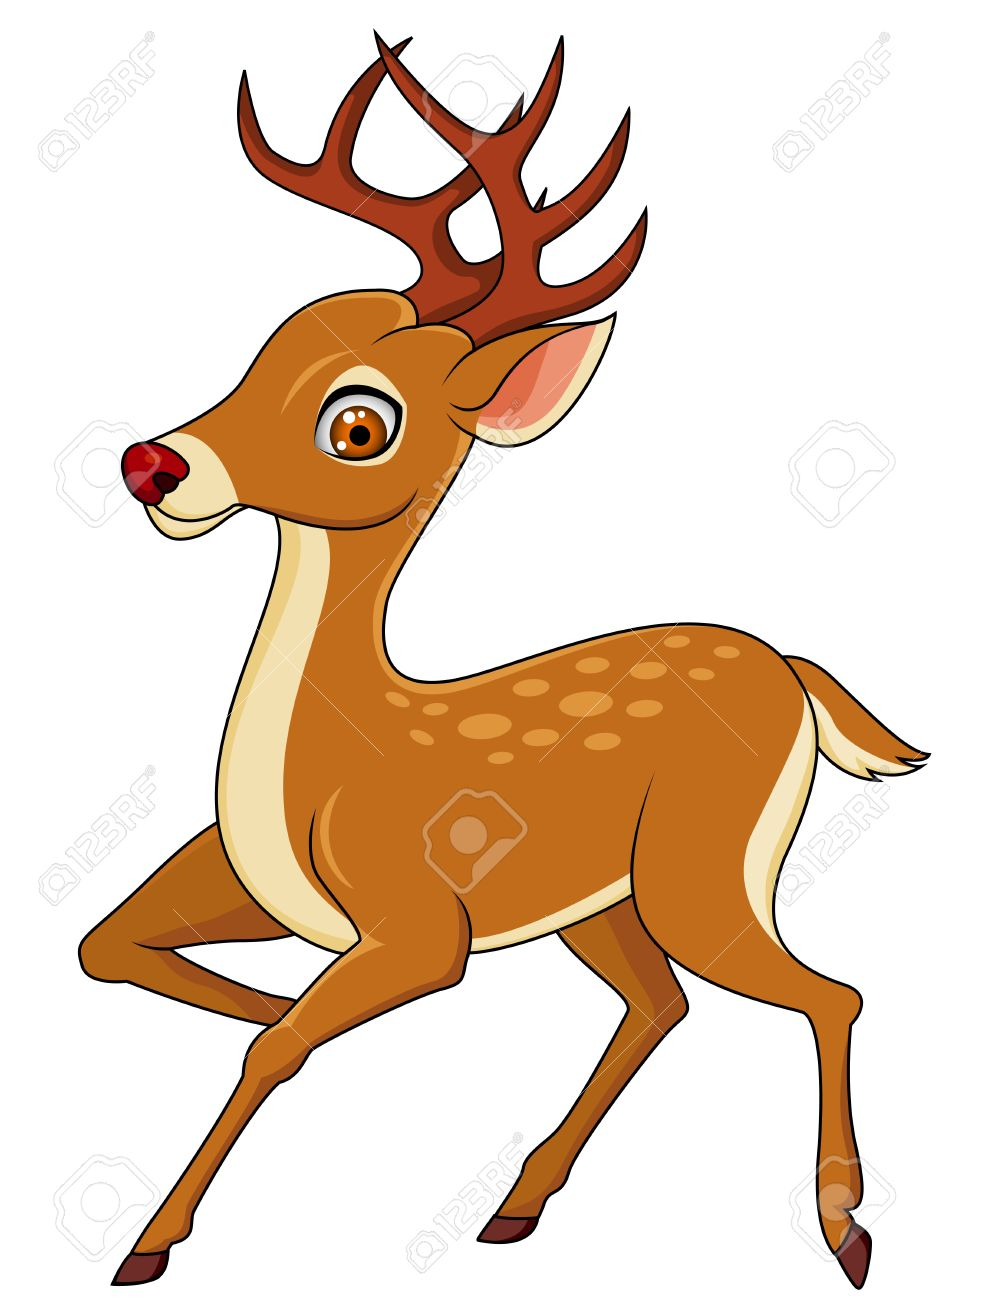 Deer cartoon.